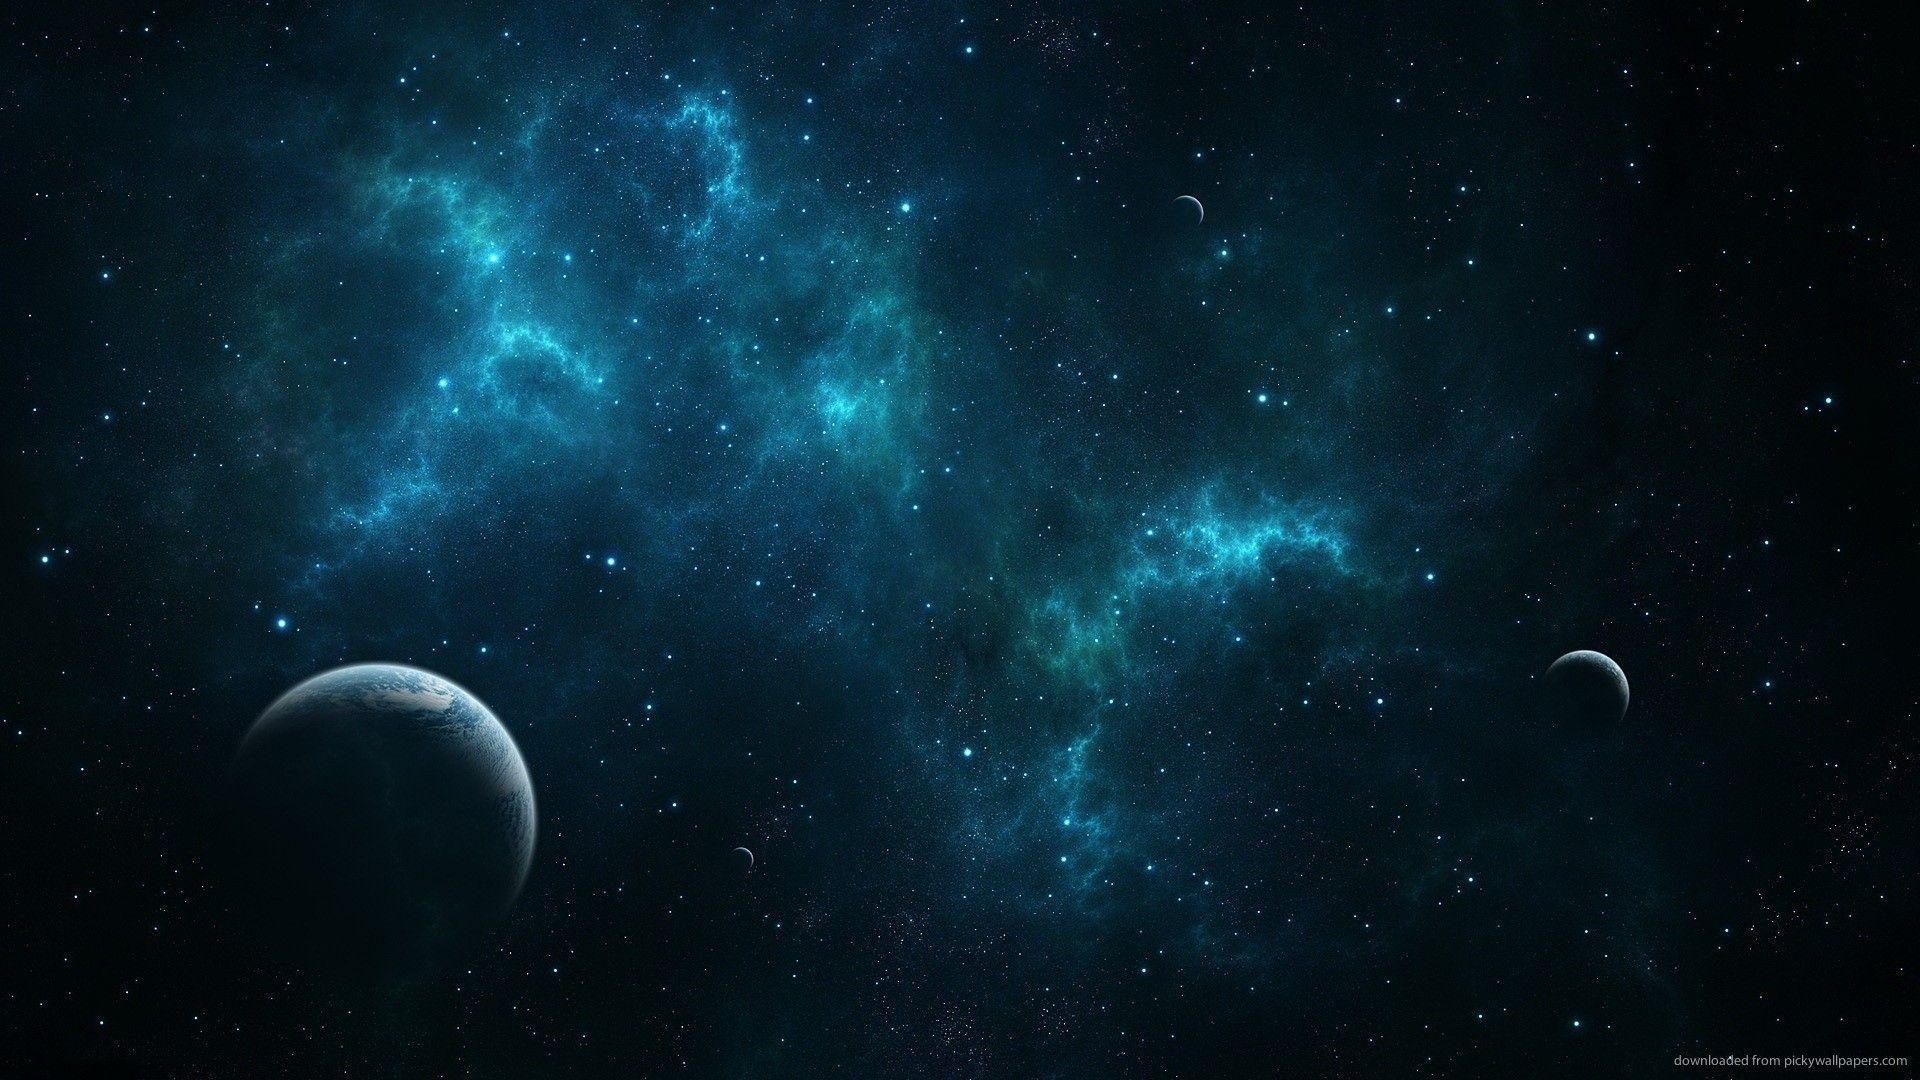 Hd Deep Blue Space Wallpaper High Resolution Space Blue